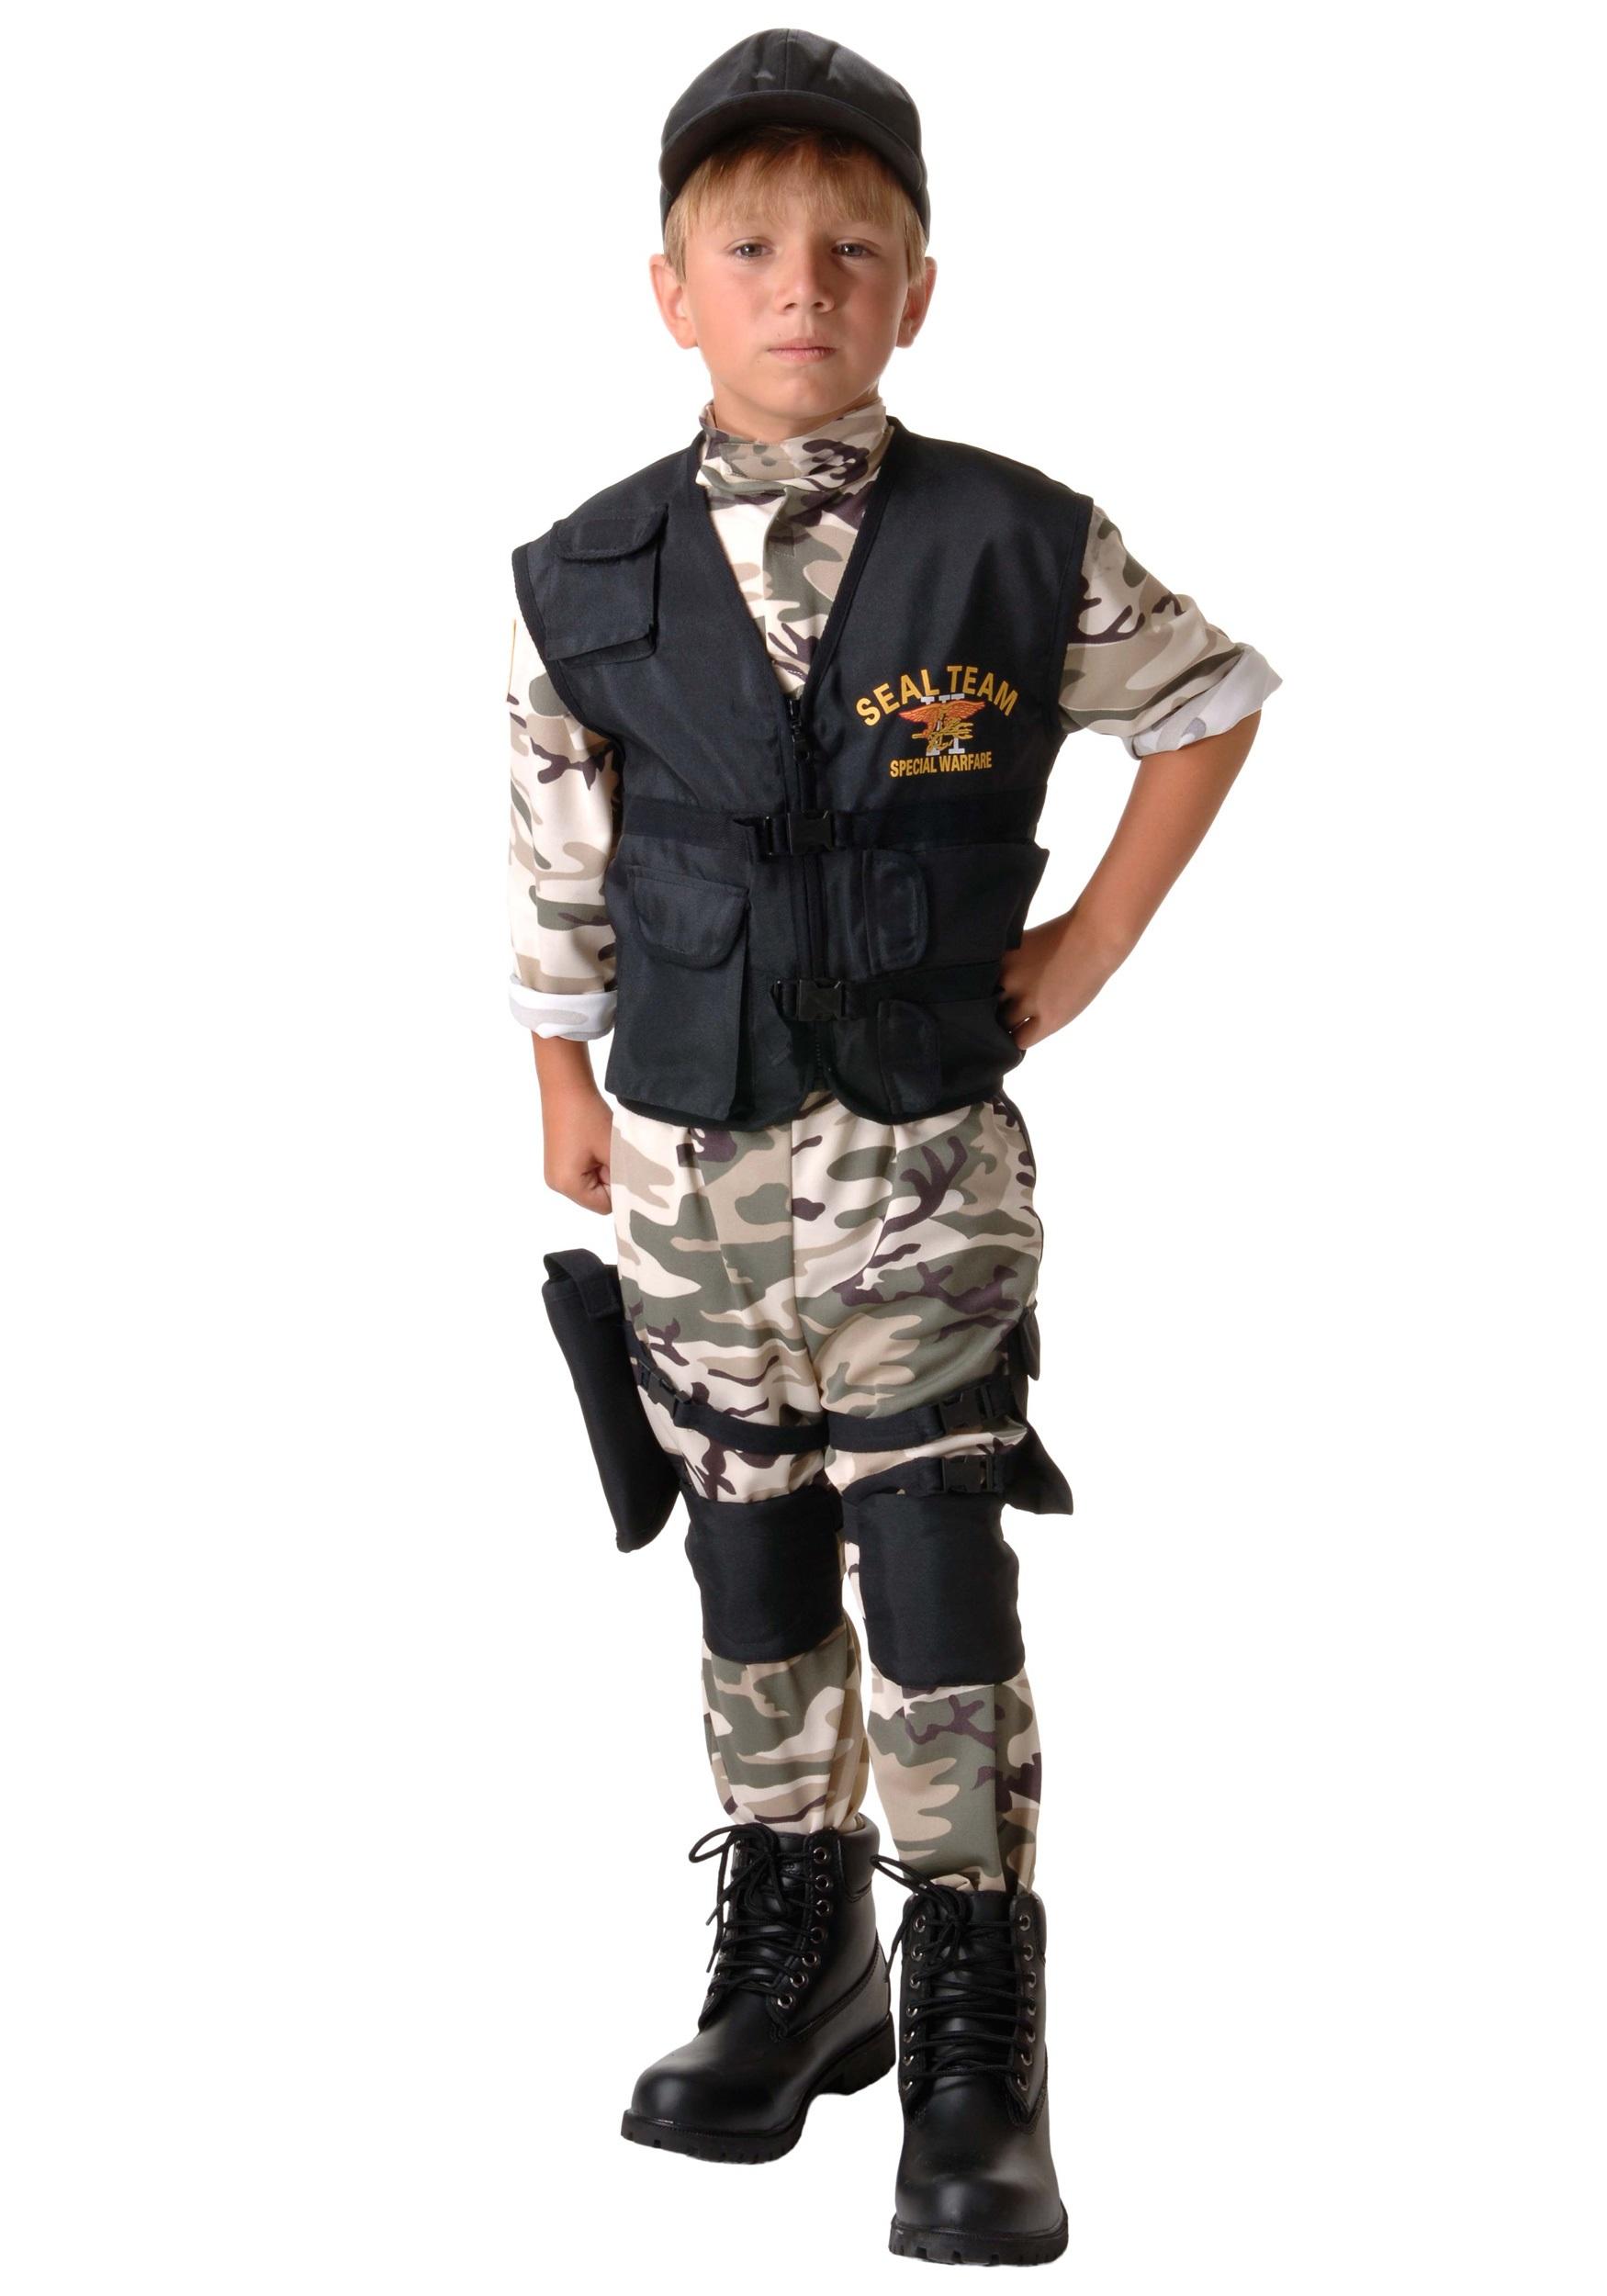 Child SEAL Team Costume UN26062